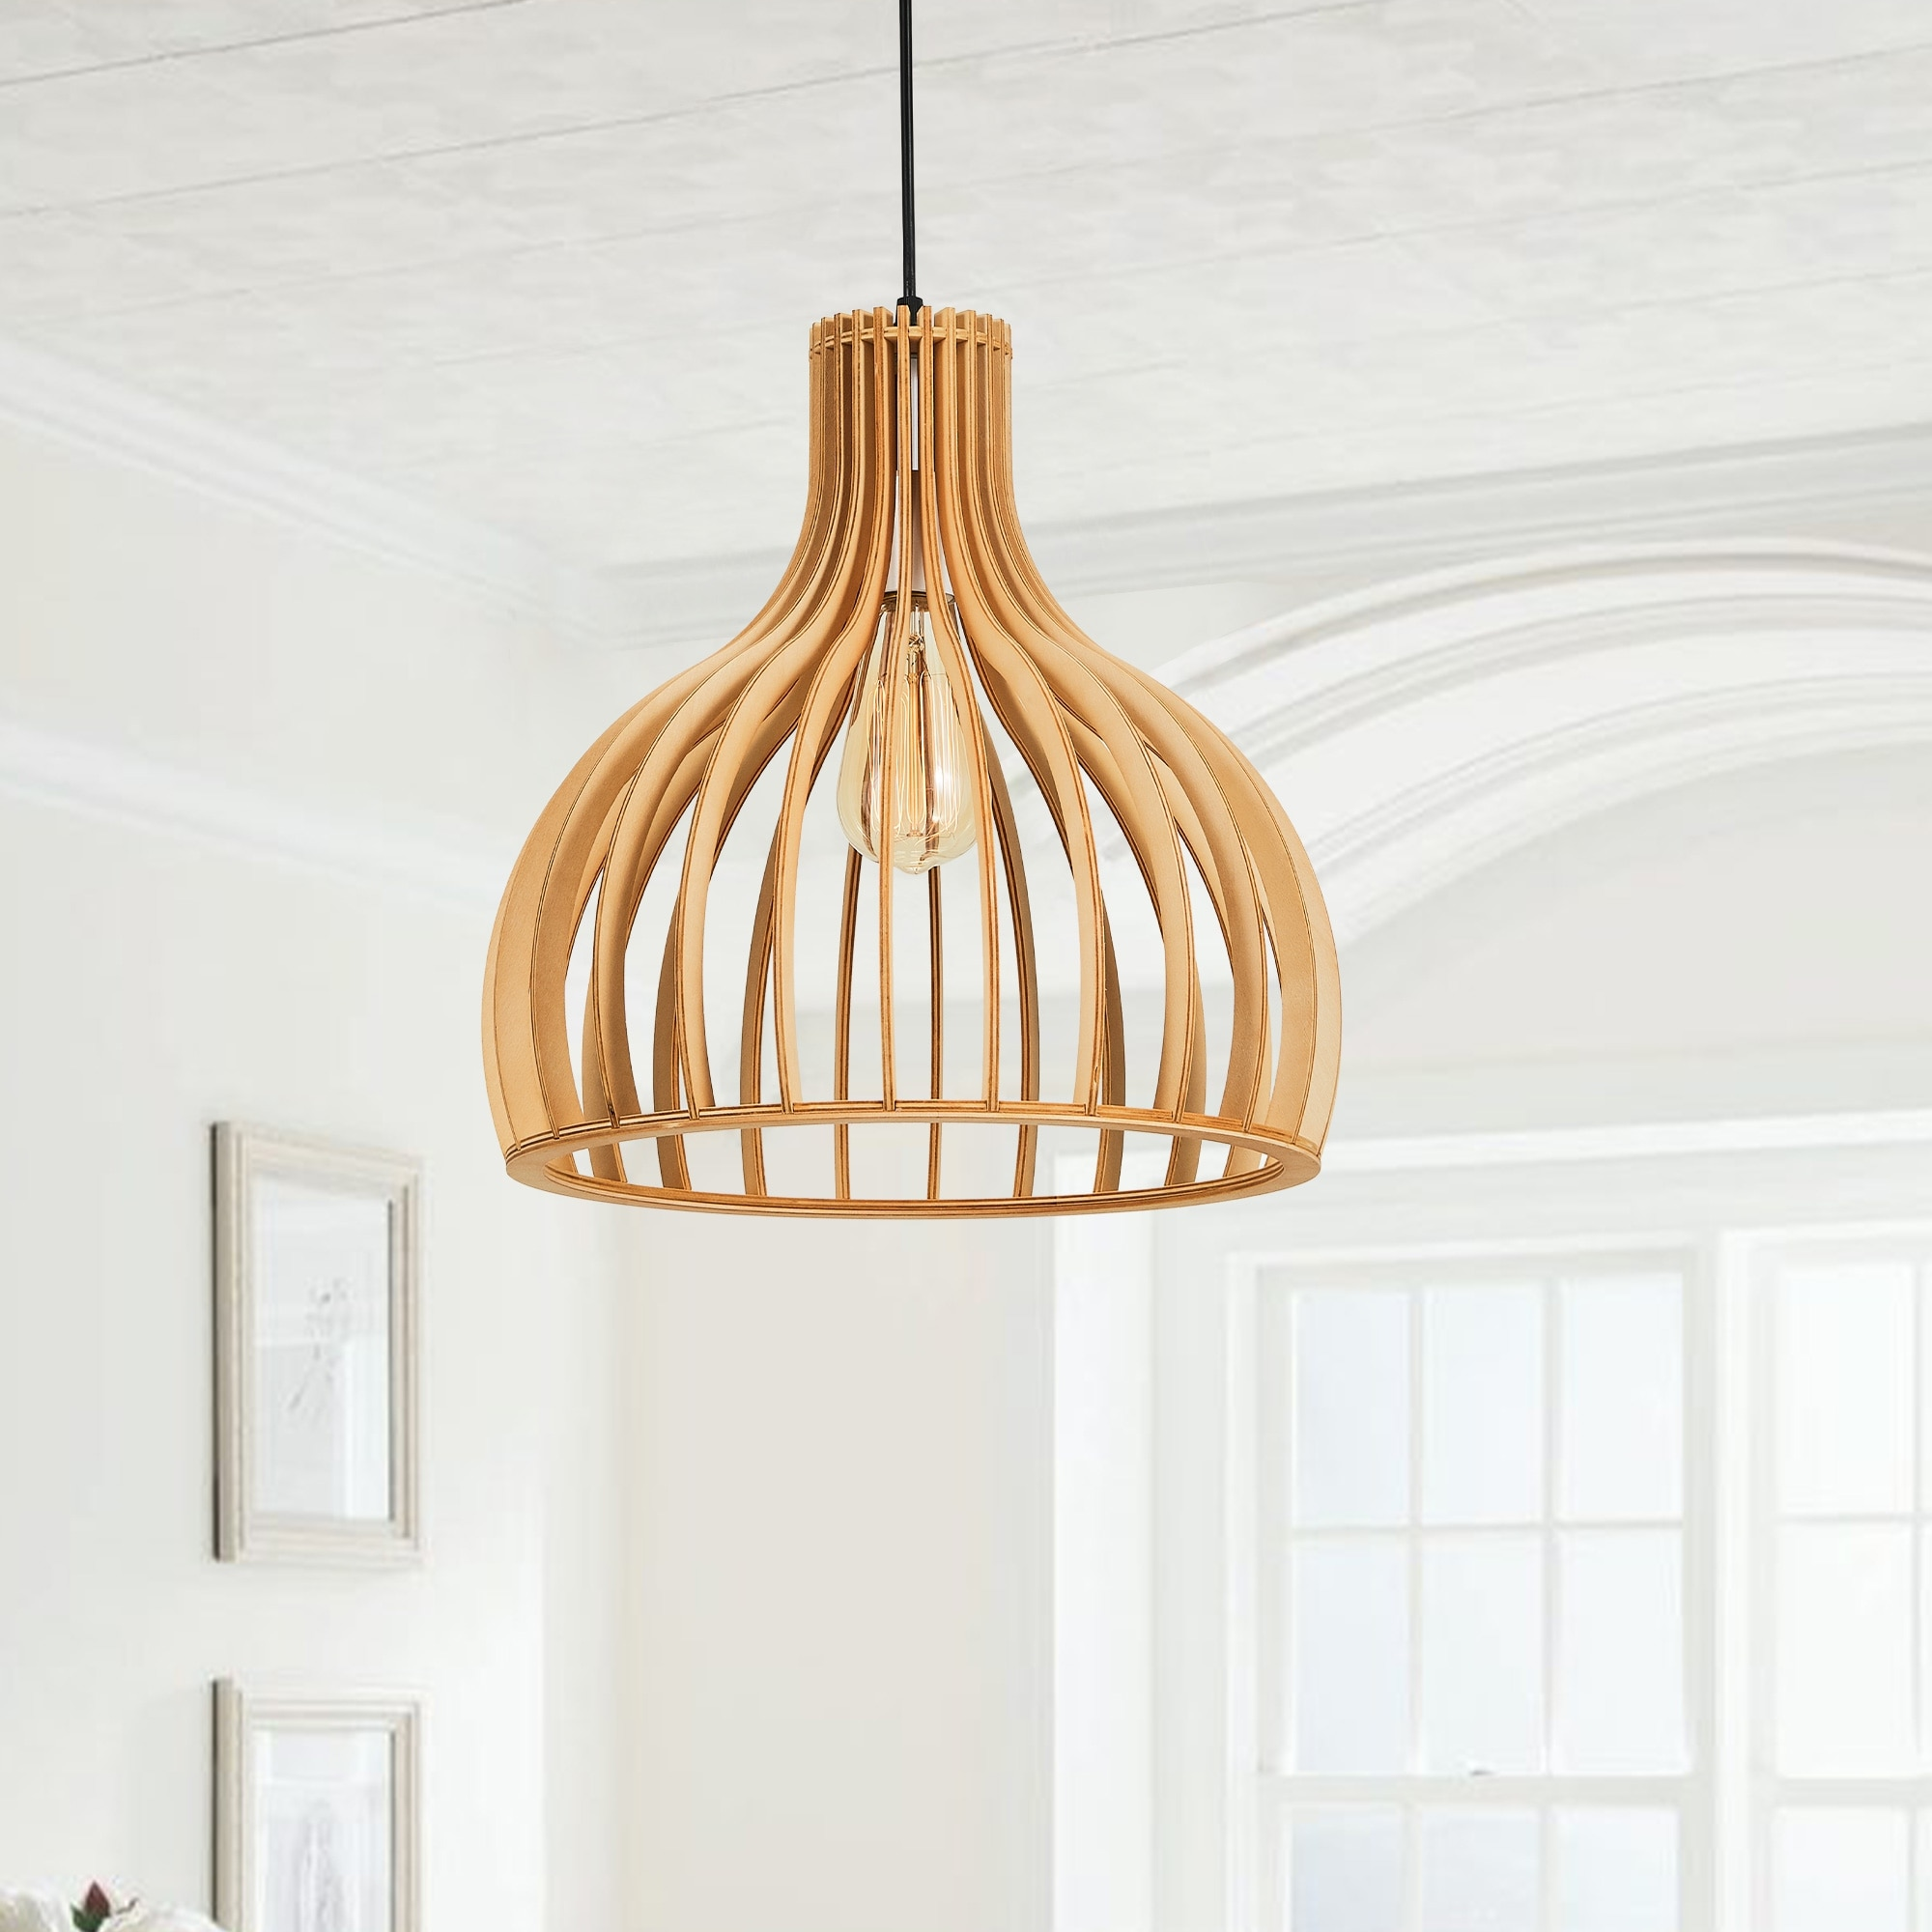 Co Z 58 Modern Wood Single Light Teardrop Pendant Ceiling Fixture Chrome Overstock 32076158